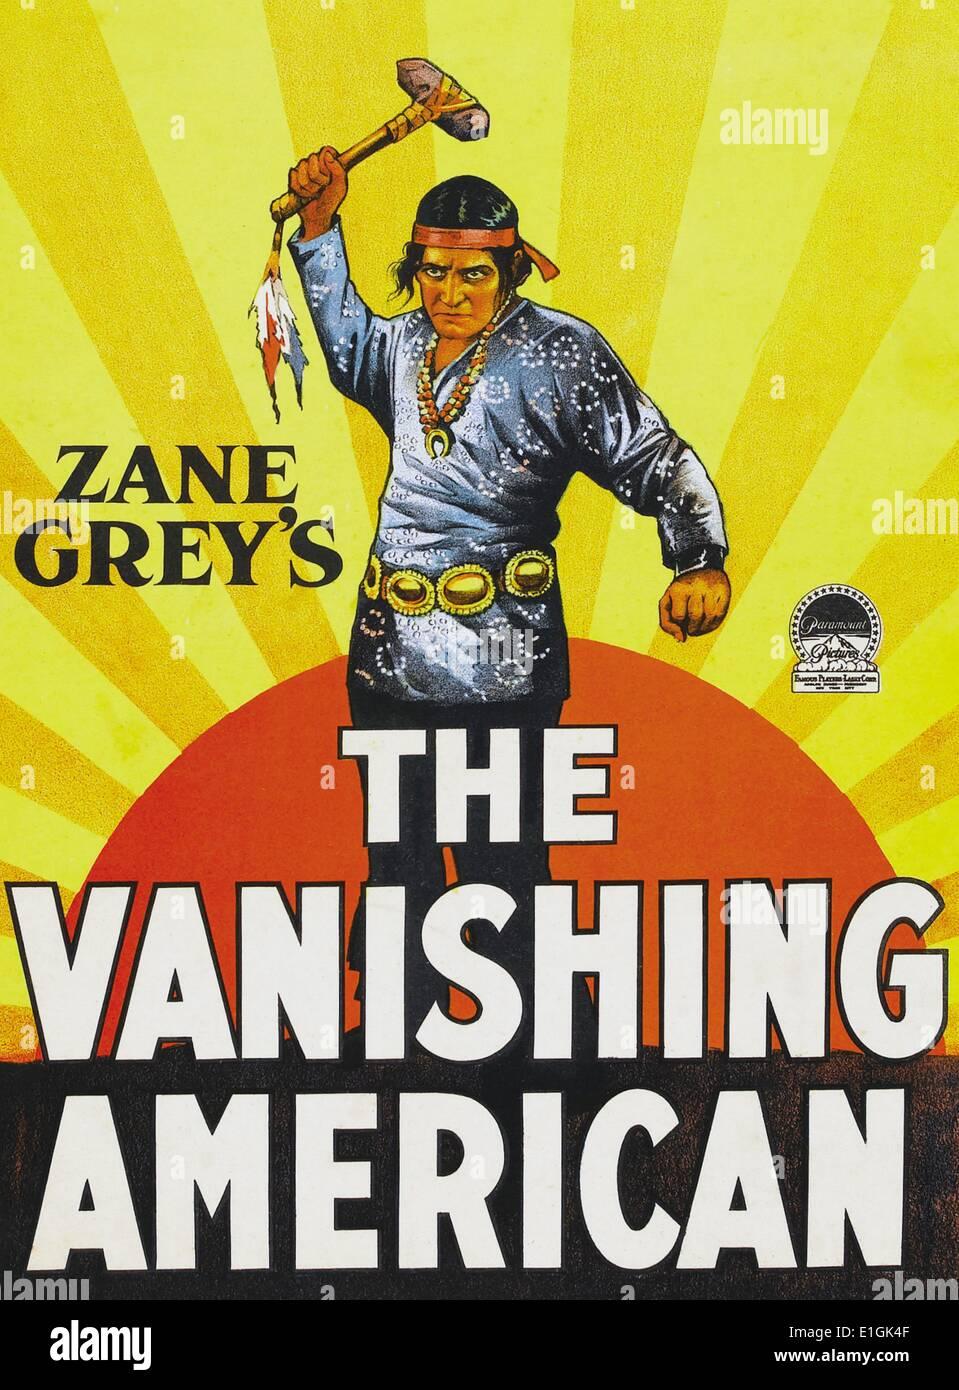 'The Vanishing American a silent film western starring Richard Dix. - Stock Image